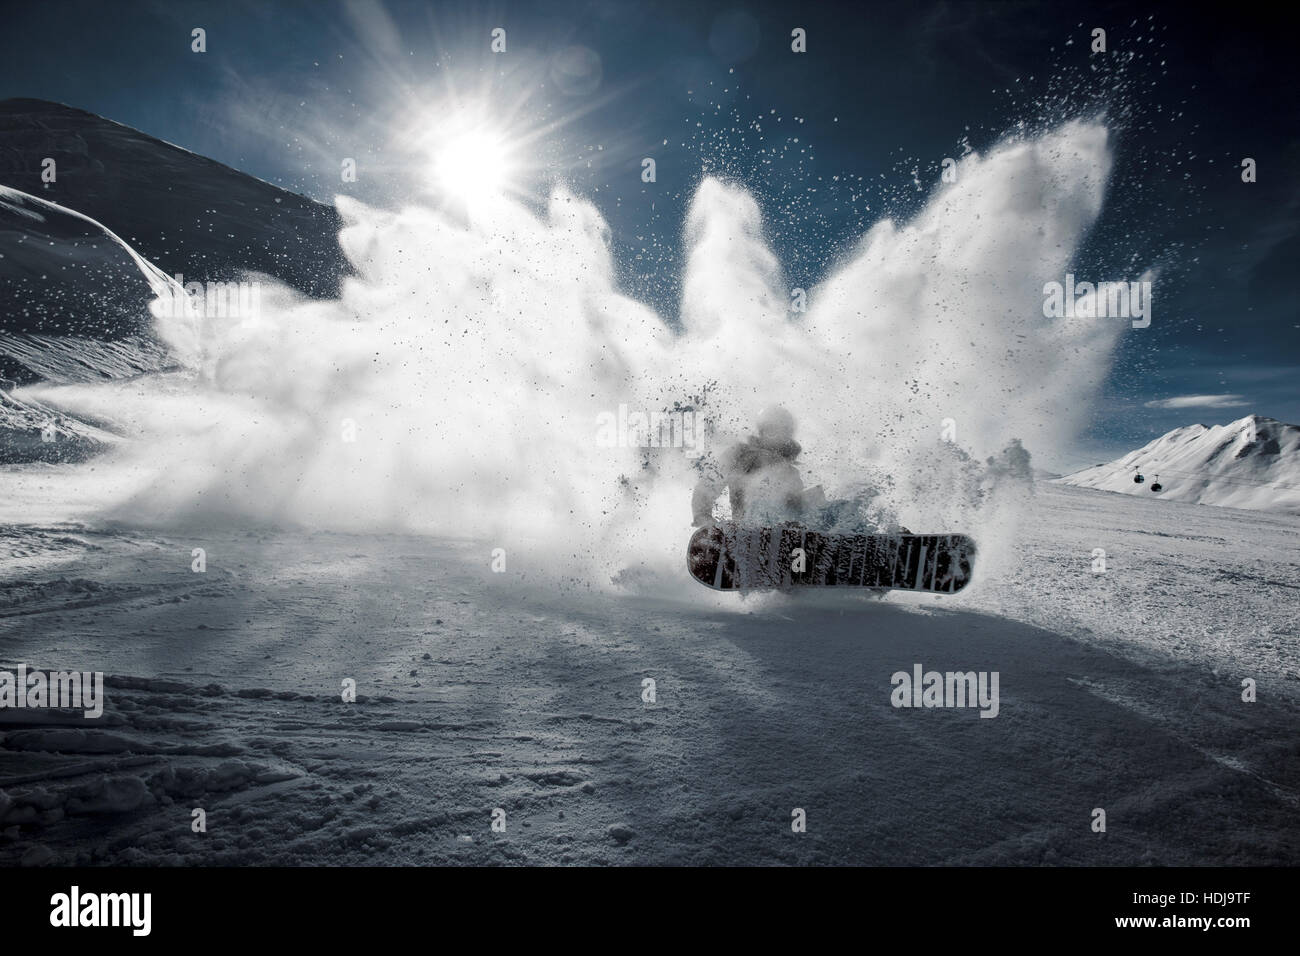 Snowboarding off-piste - Stock Image